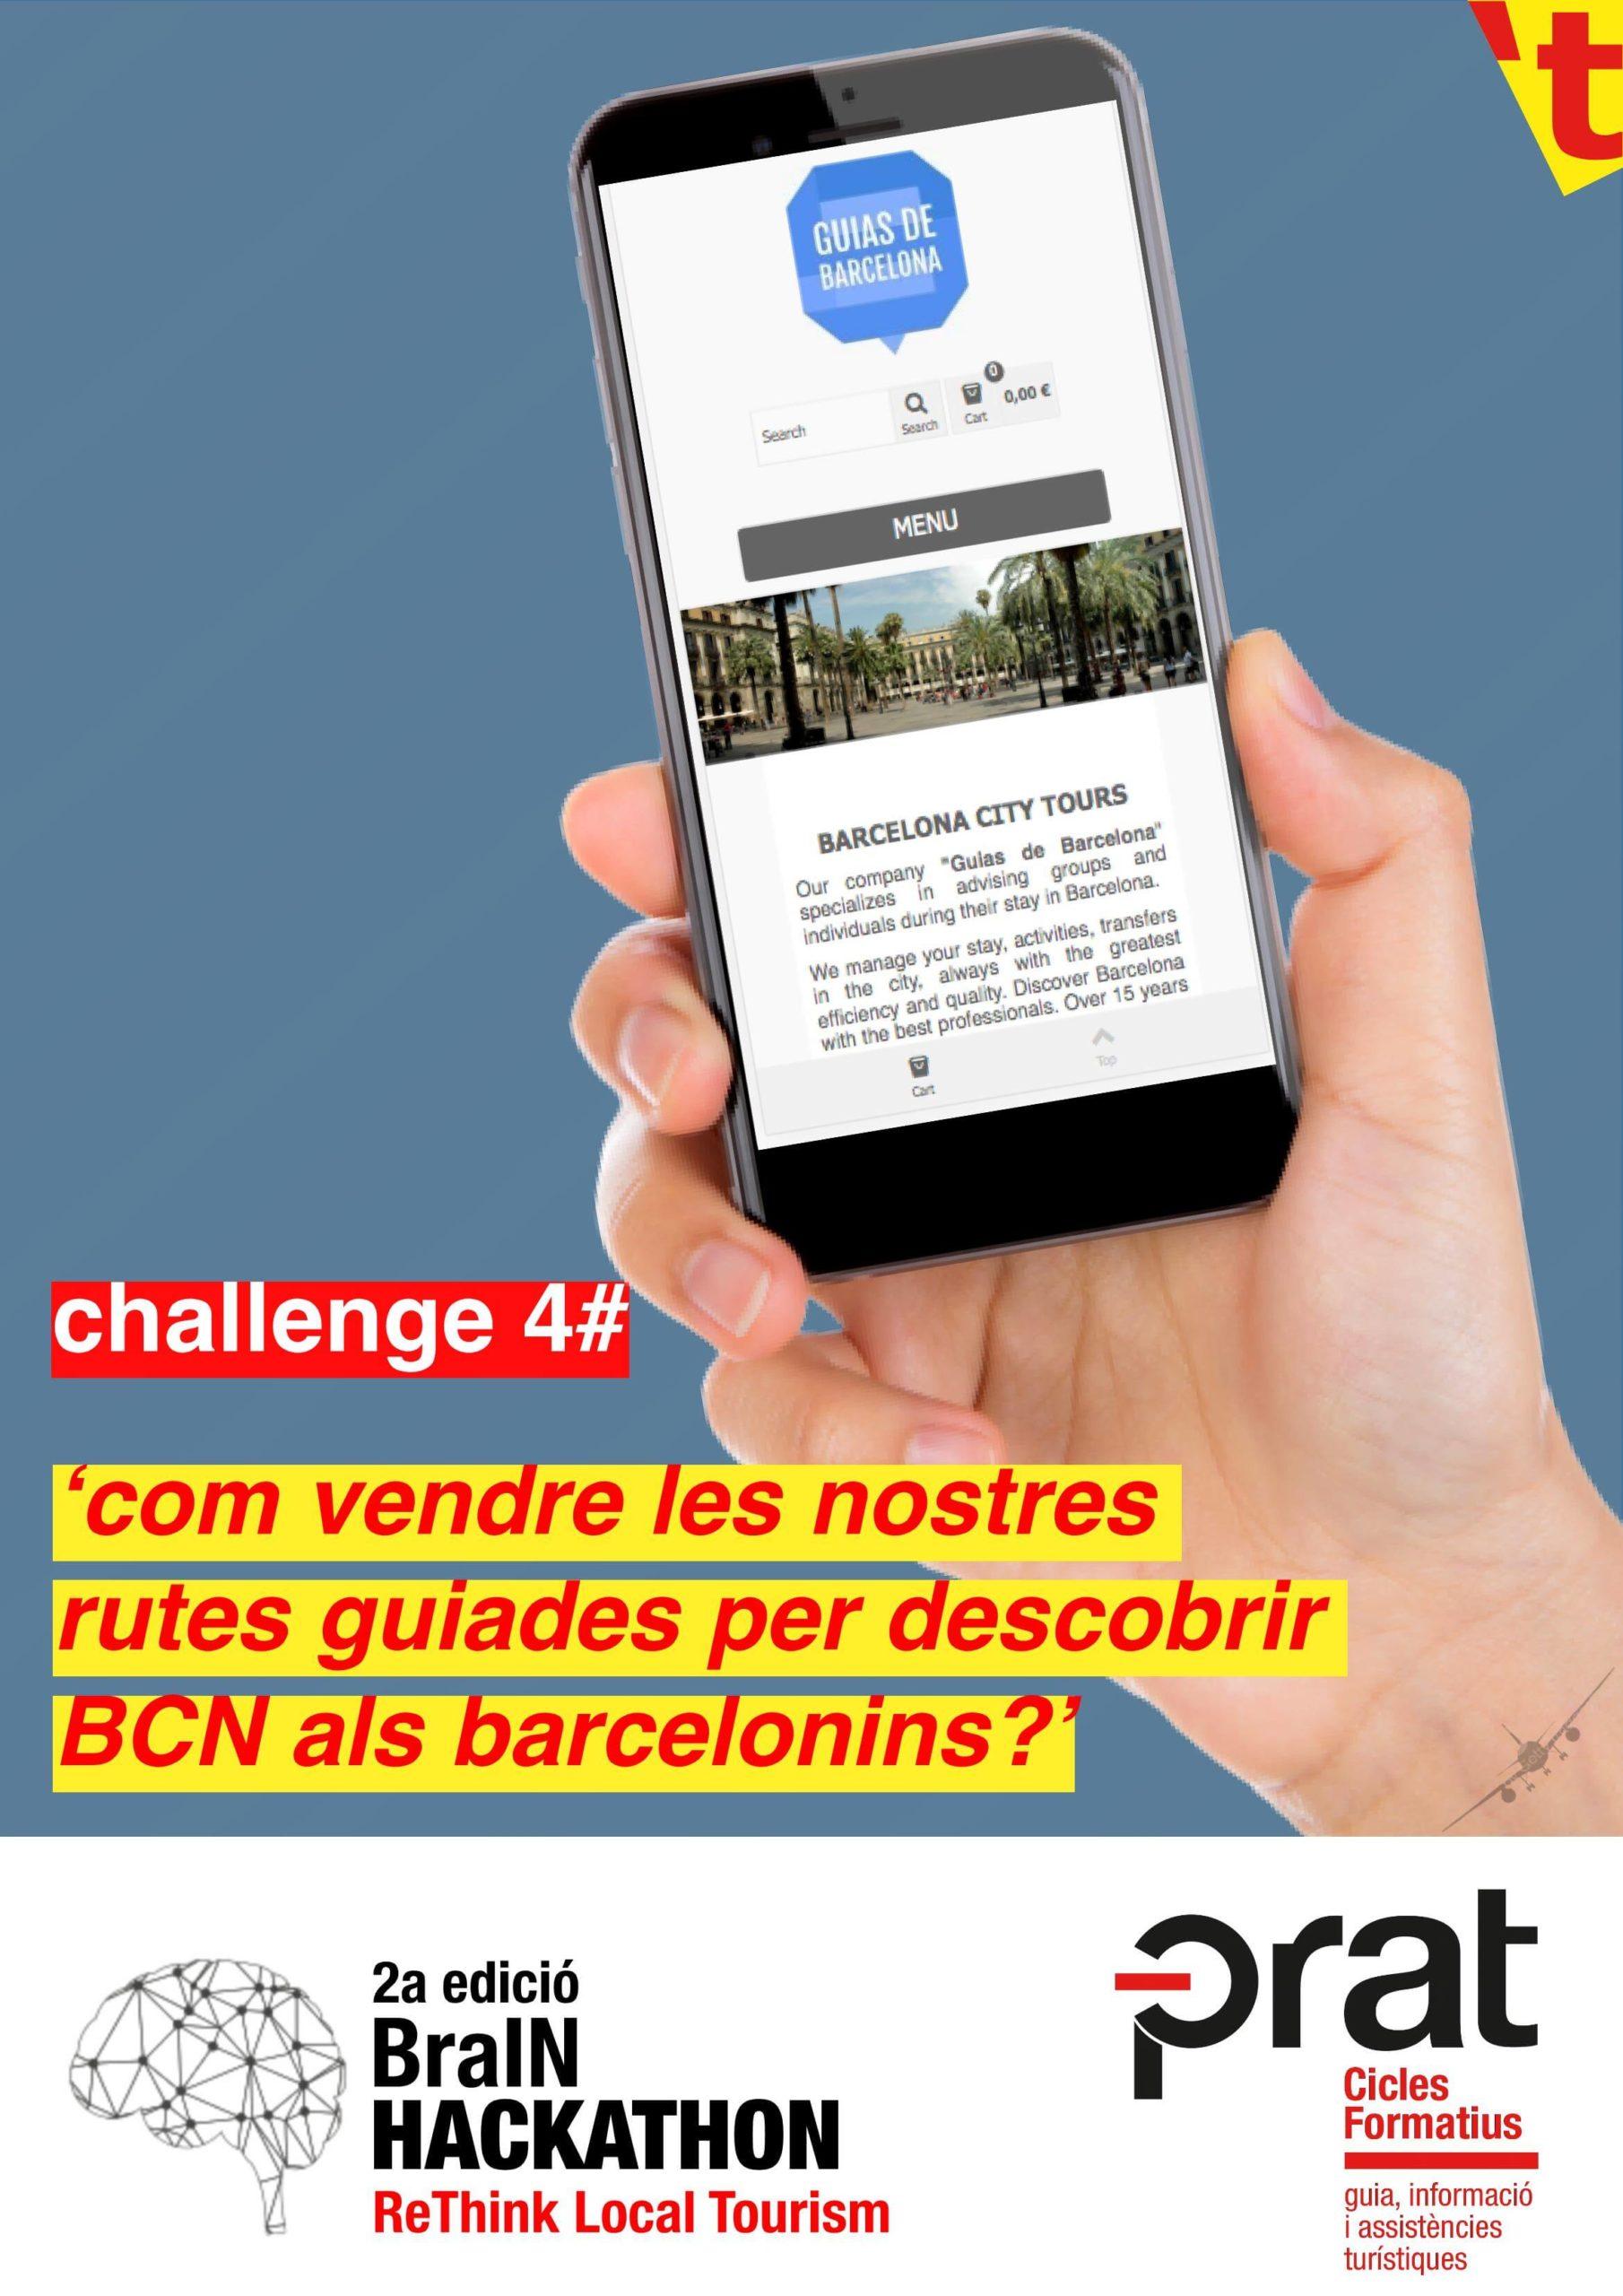 Hackathon de Turisme: repte 4 - Cicle Formatiu de Grau Superior de Turisme a Prat Educació